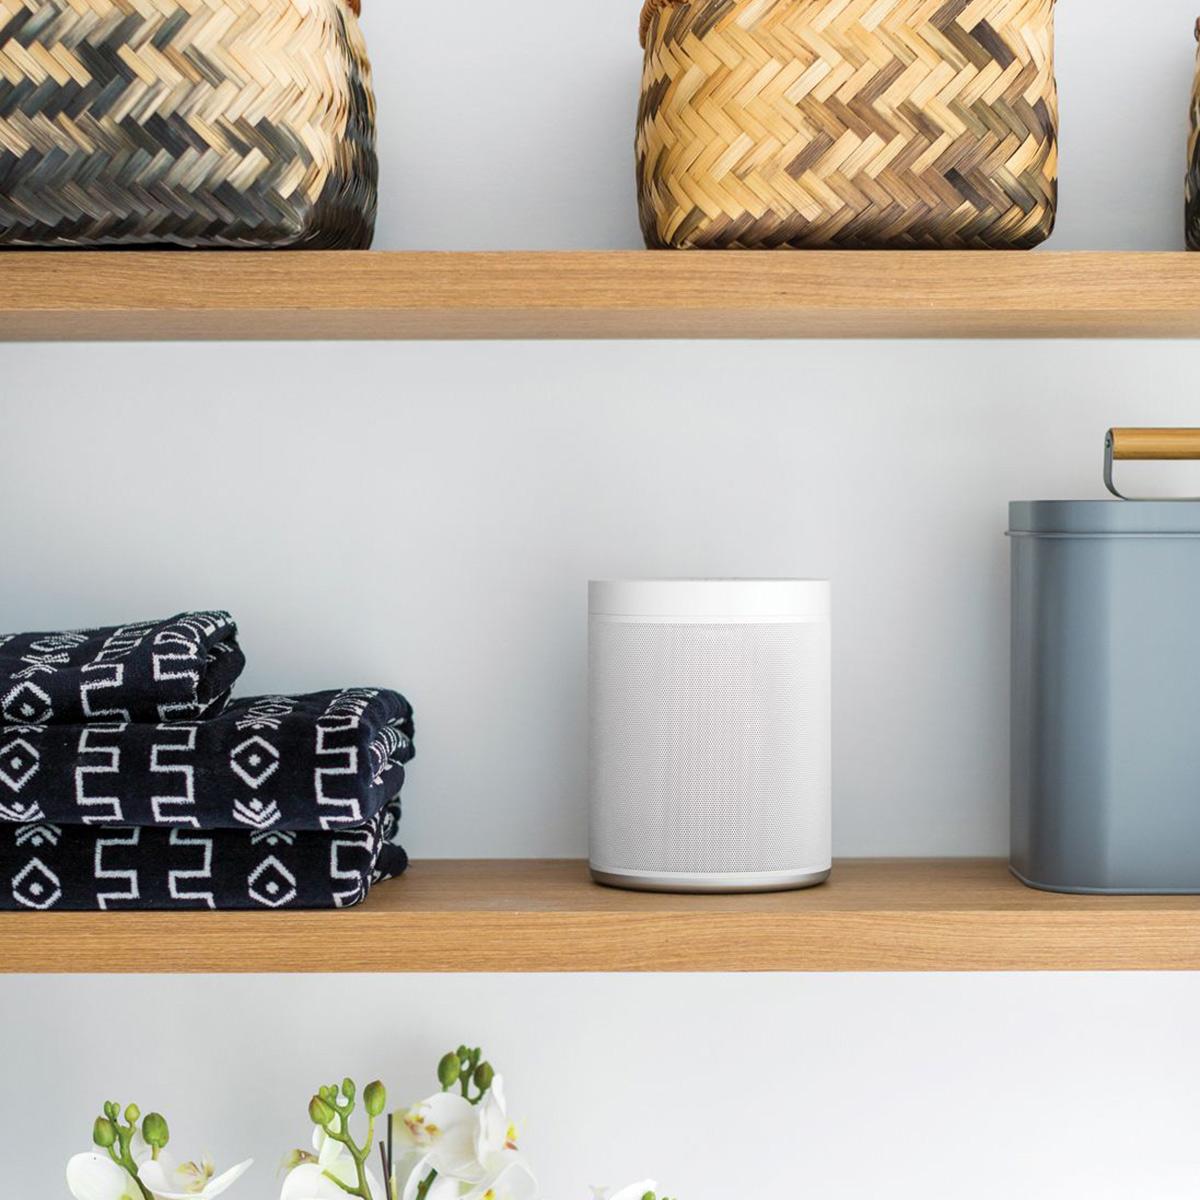 Yamaha-WX-021-MusicCast-20-Wireless-Speaker thumbnail 18